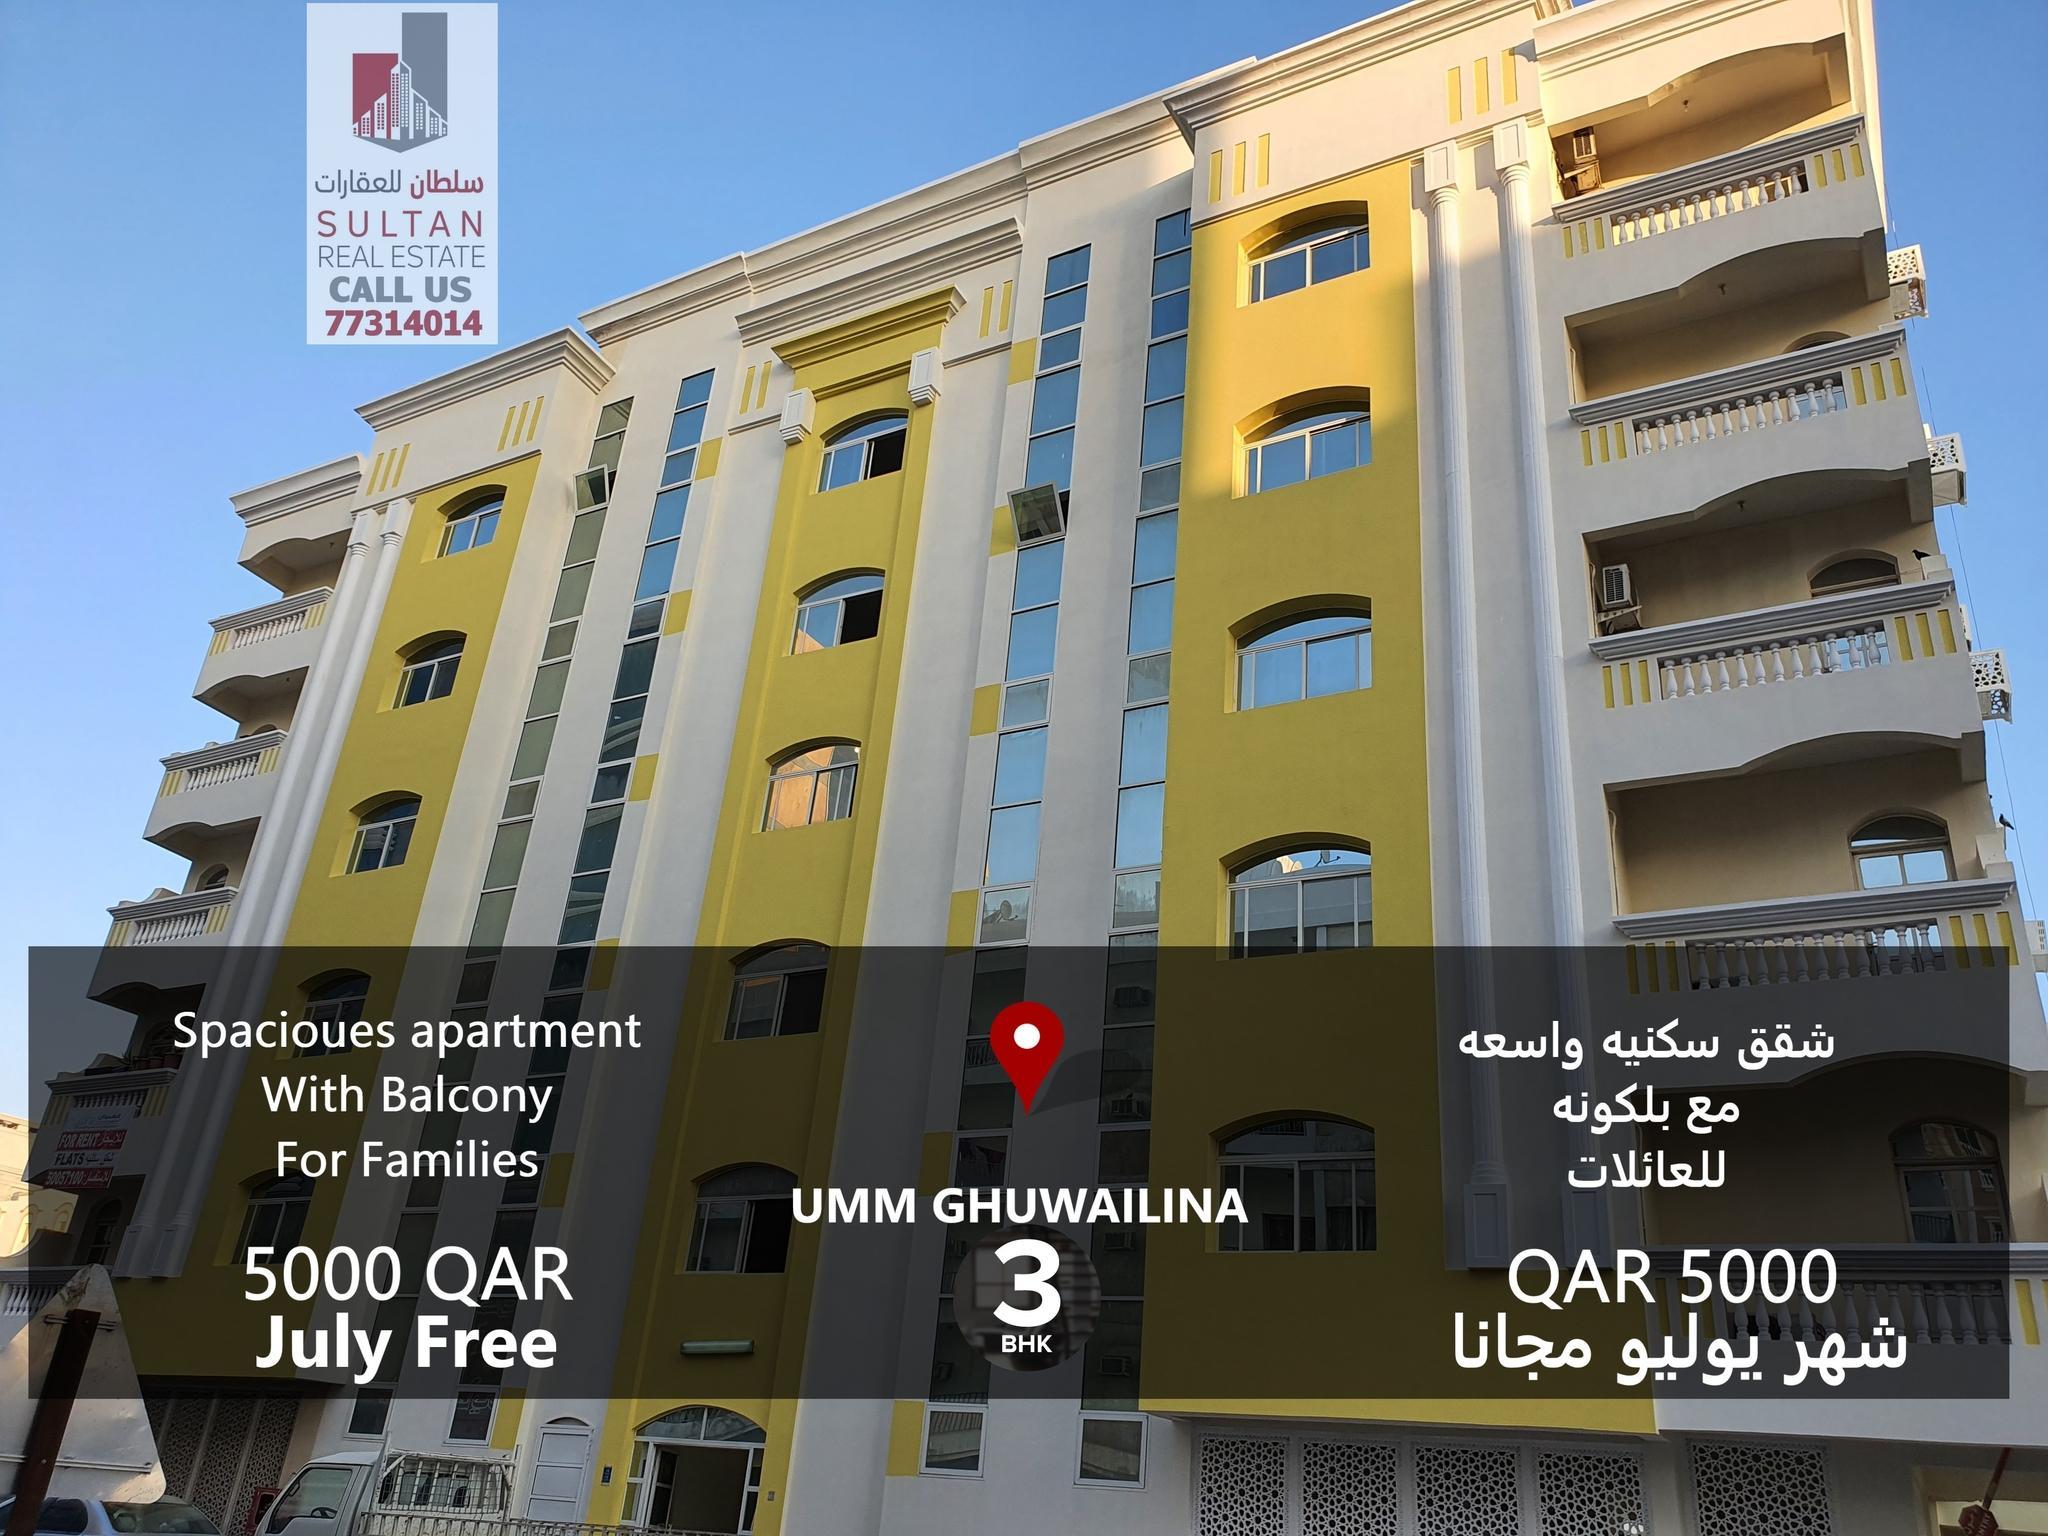 Apartment for rent in Umm Ghwailina, Qatar | Qatar Living ...